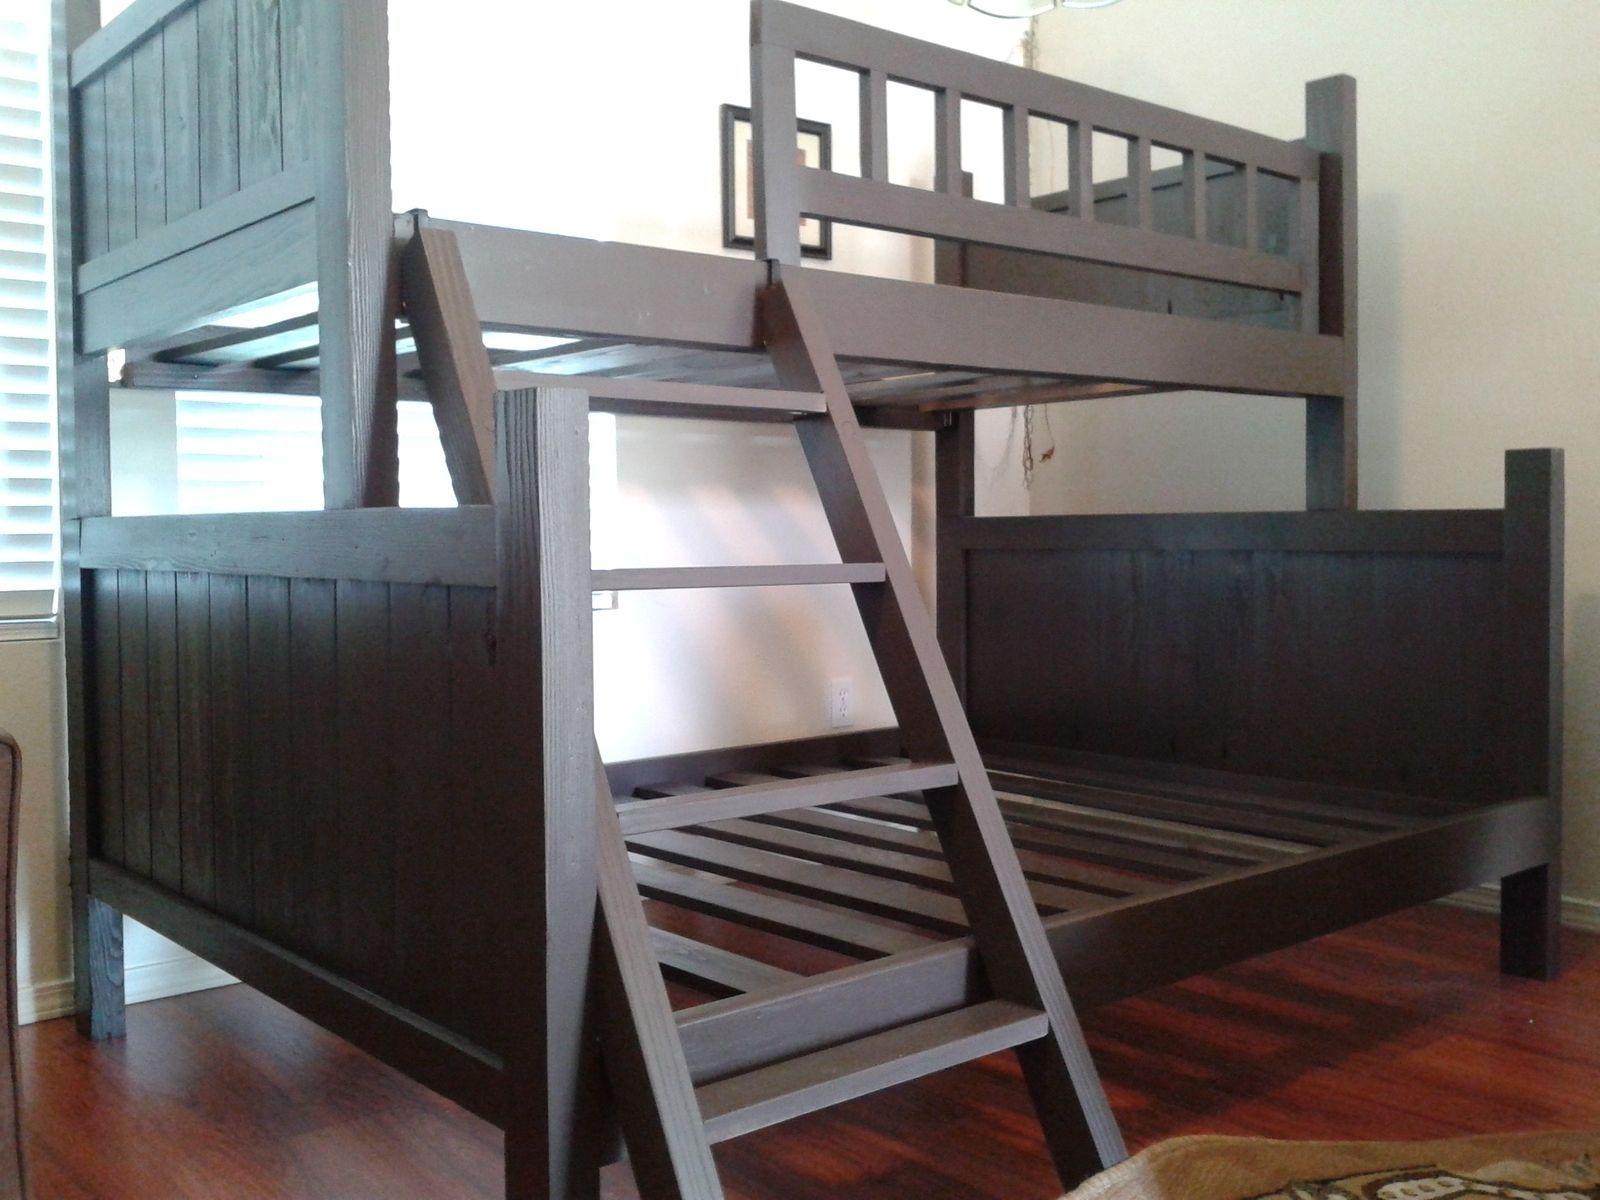 Bedding Princess Bunk Beds For Girls Inspiration Cheap On Craigslist Pottery Barn Dubai